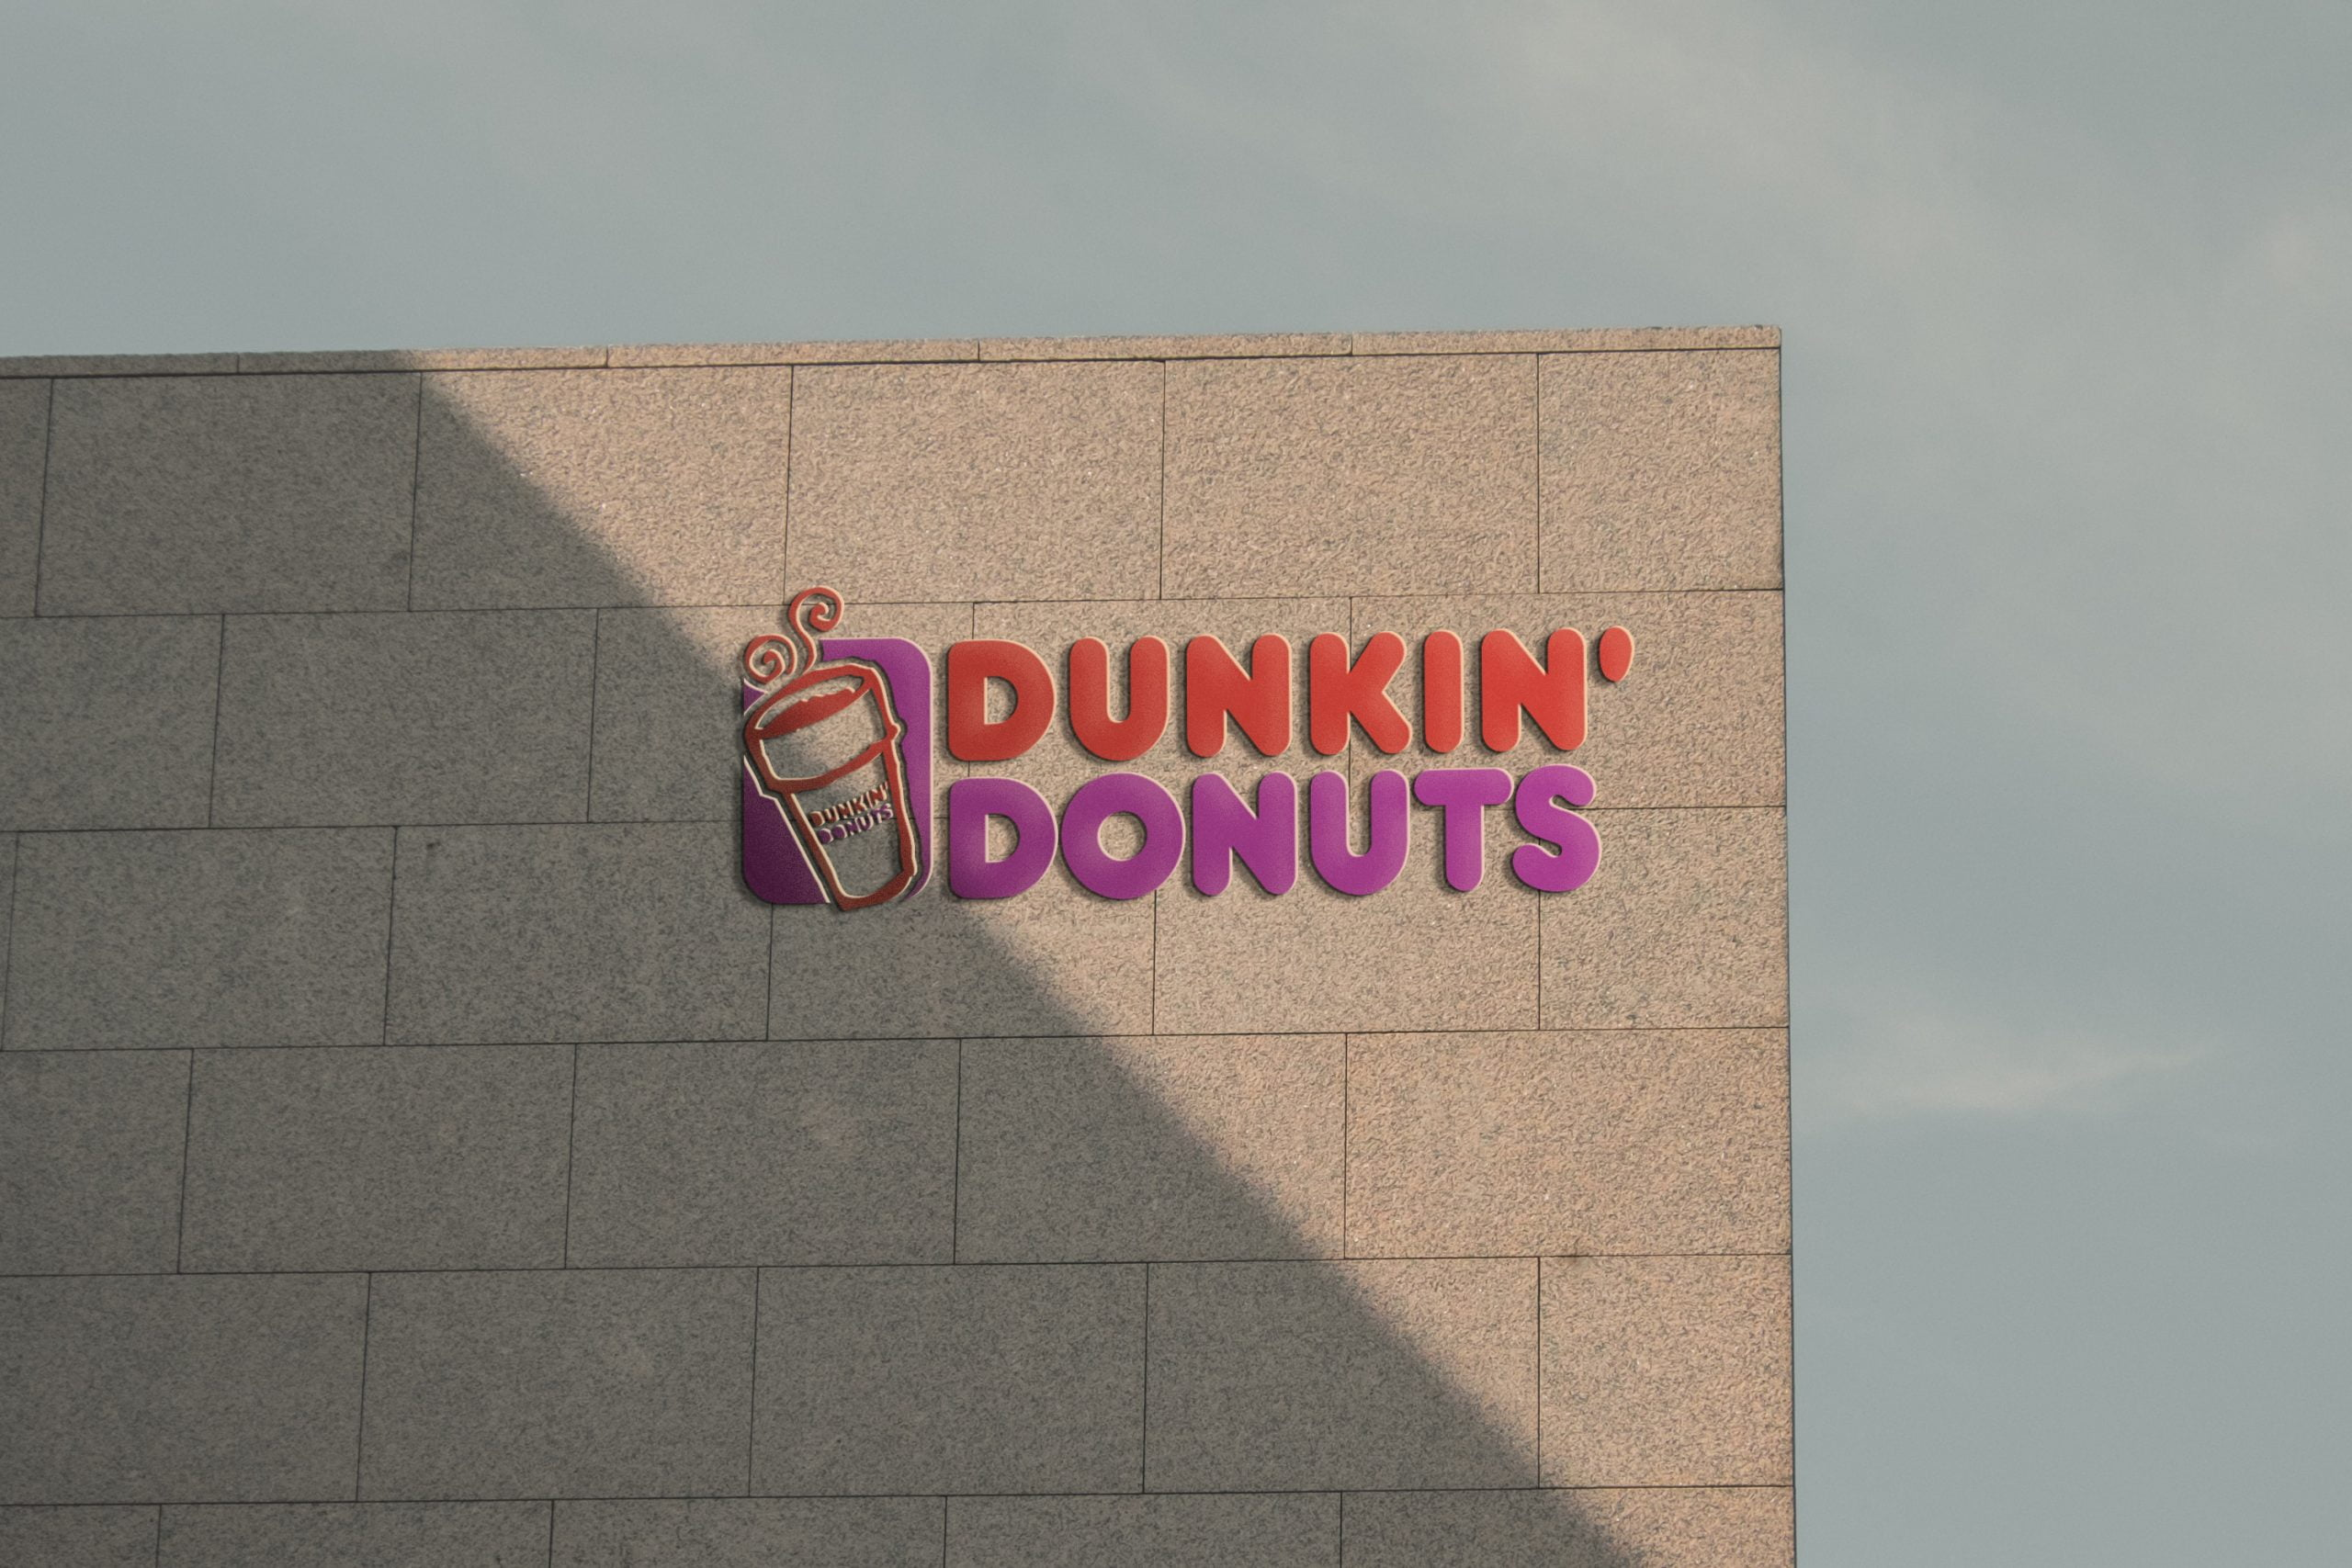 Sunset Wall 3D Logo Mockup Free